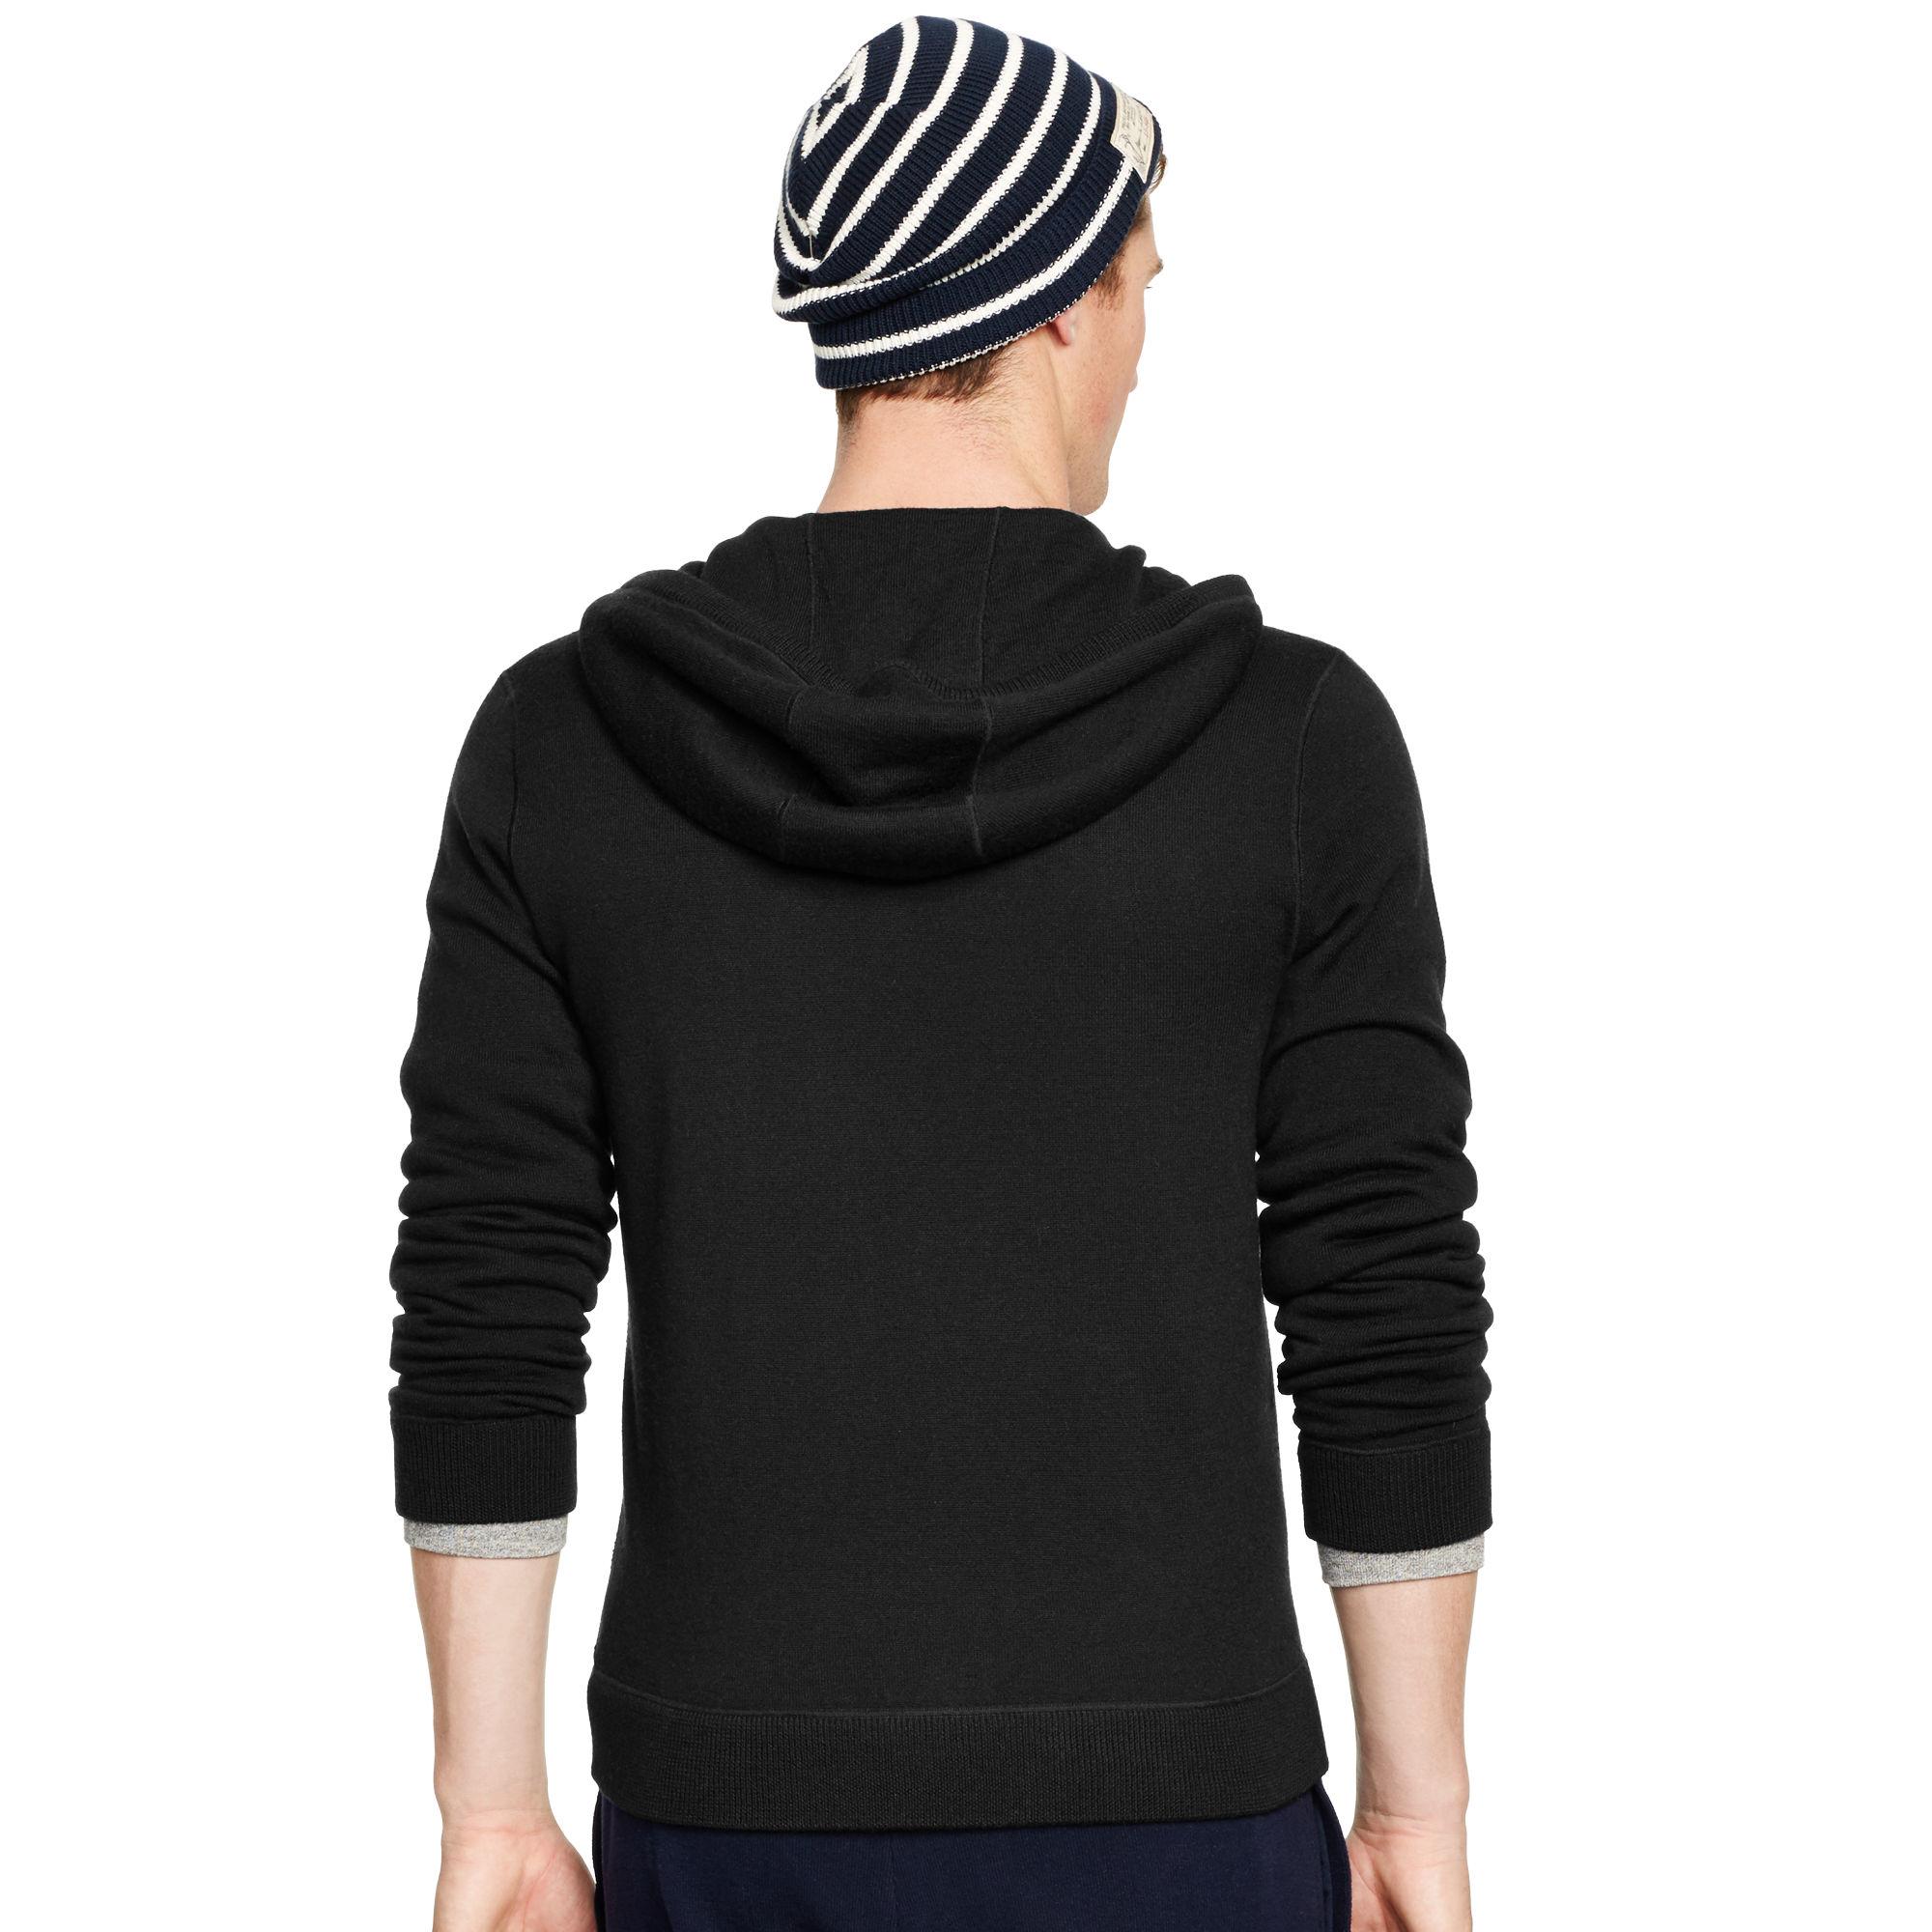 polo ralph lauren cashmere hoodie in black for men lyst. Black Bedroom Furniture Sets. Home Design Ideas